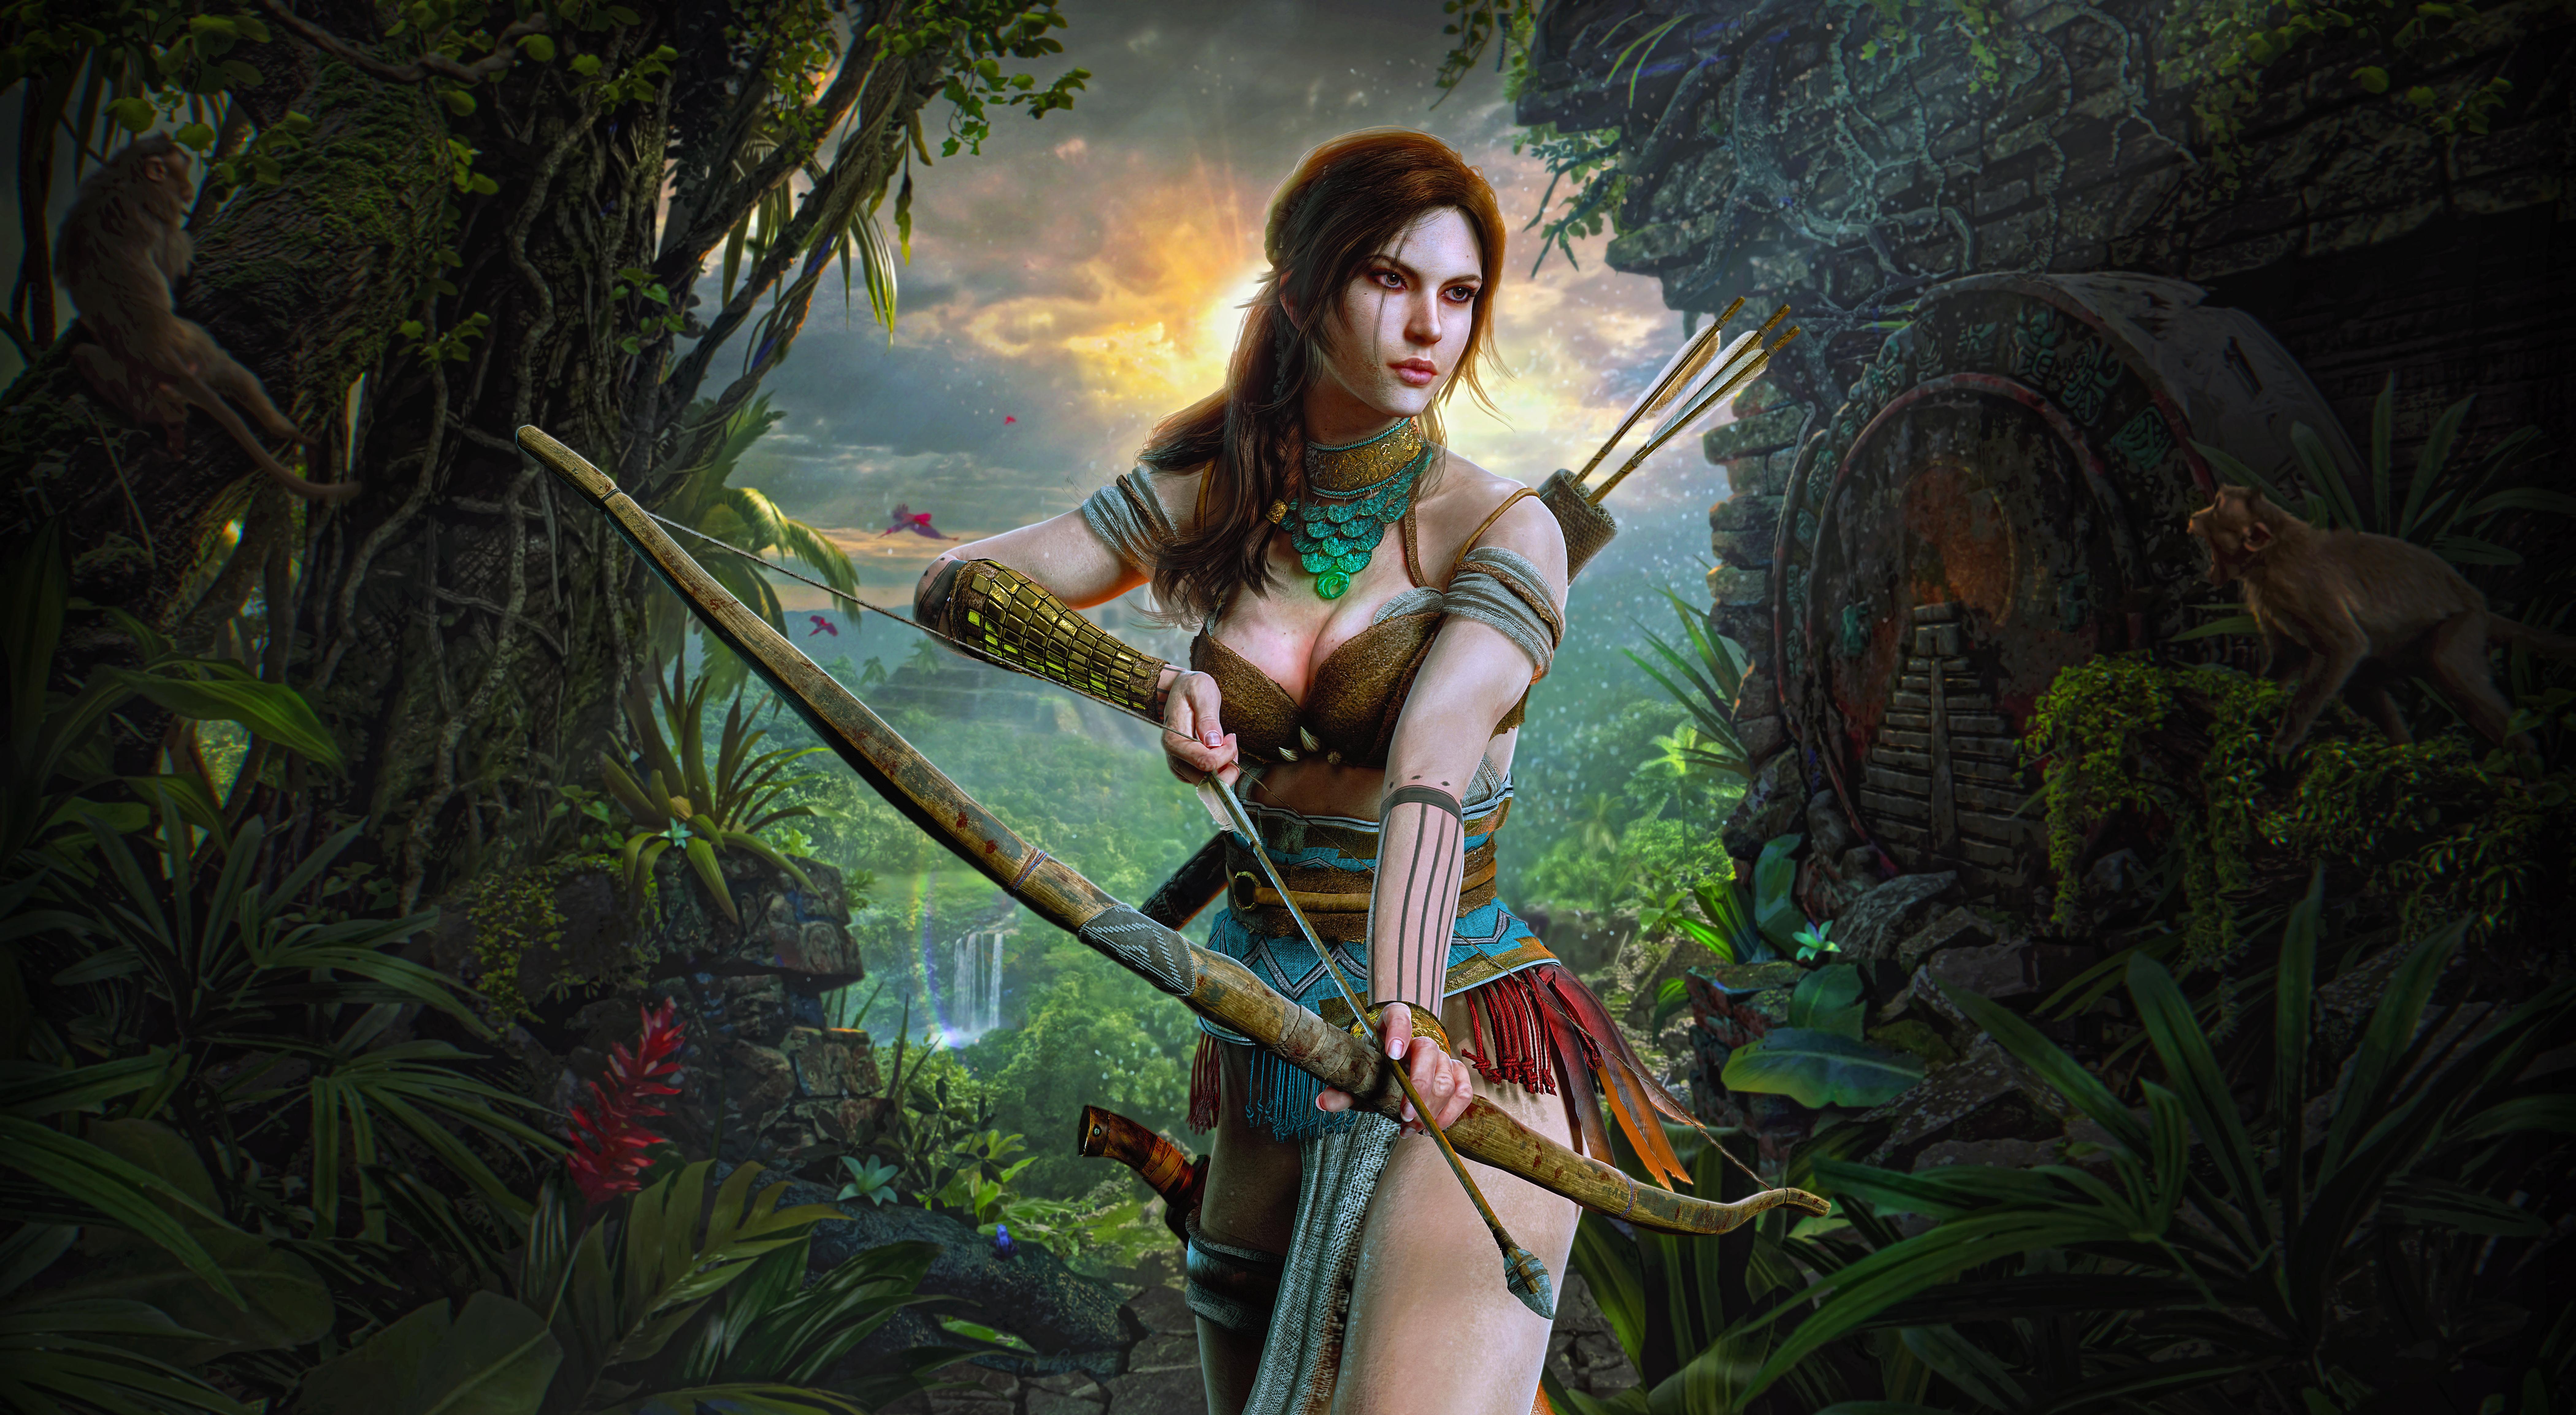 lara croft hunter girl 1578854608 - Lara Croft Hunter Girl - Lara Croft wallpaper 4k, Lara Croft Hunter Girl 4k wallpaper